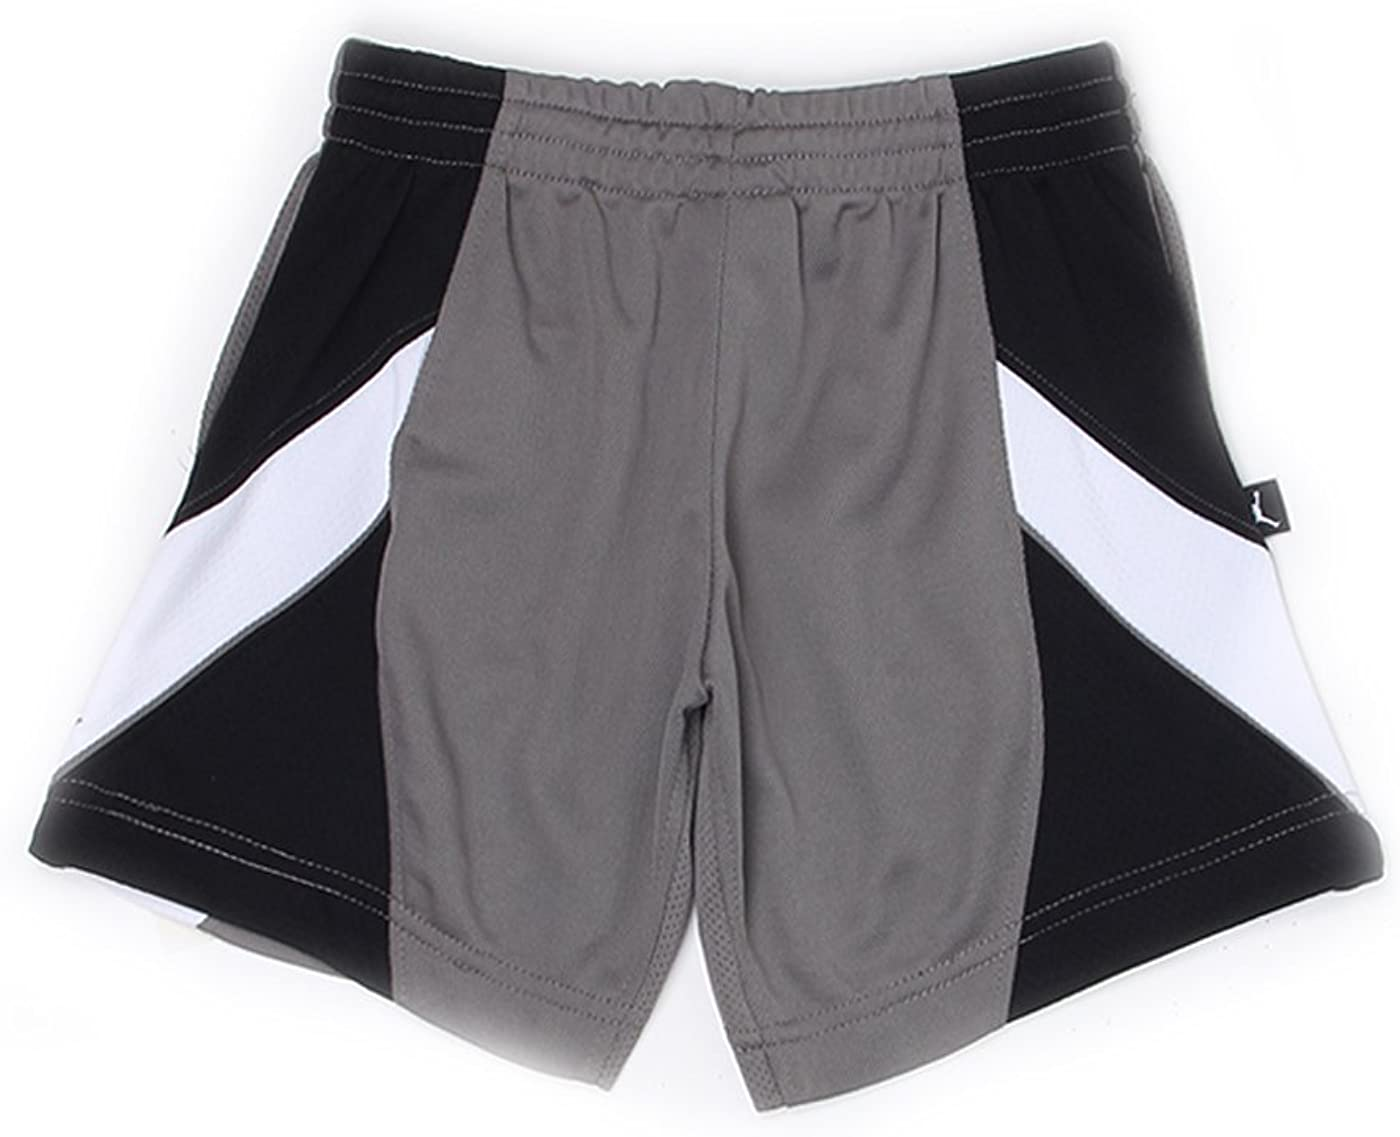 Jordan Nike Air Jumpman Boys Basketball Shorts, Flat Pewter, Large, 950922 292